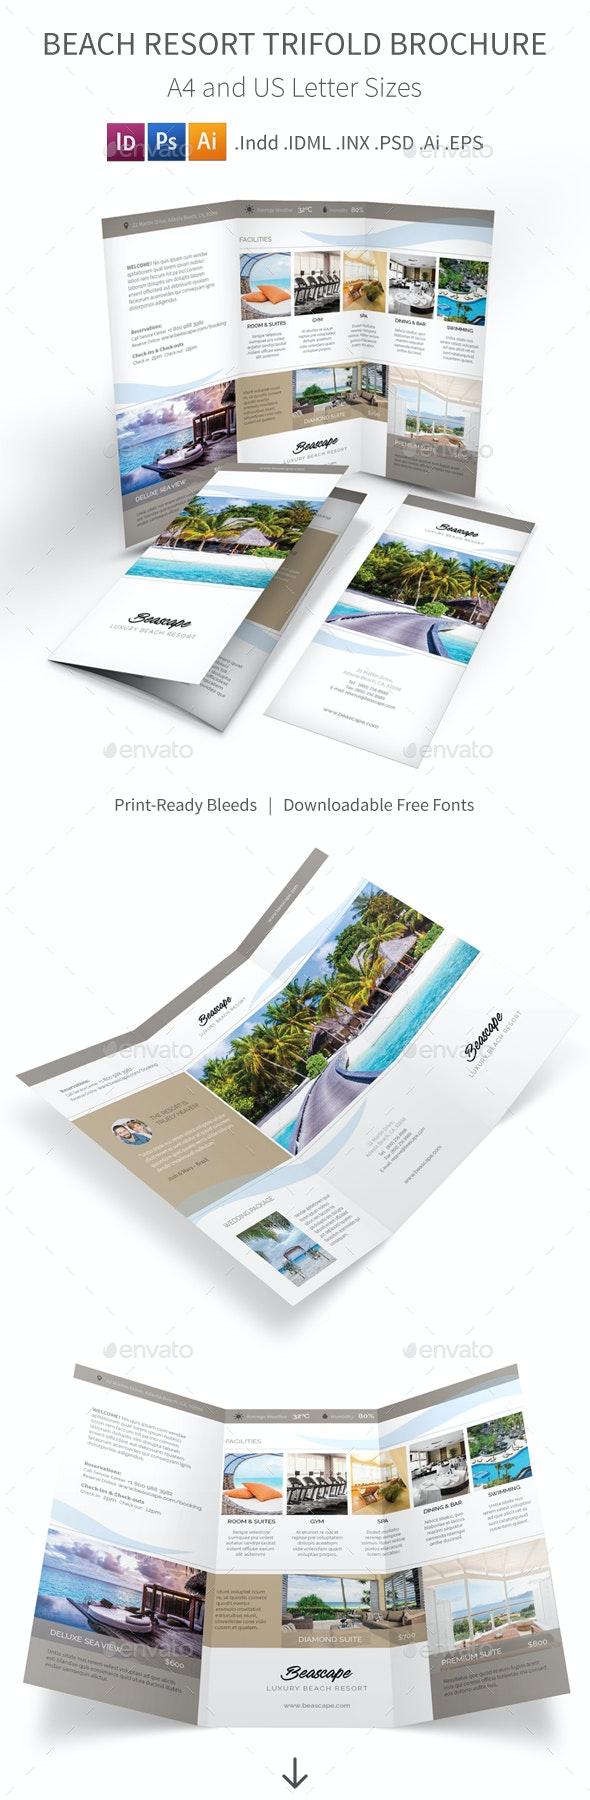 Beach Resort Trifold Brochure 2 - Corporate Brochures